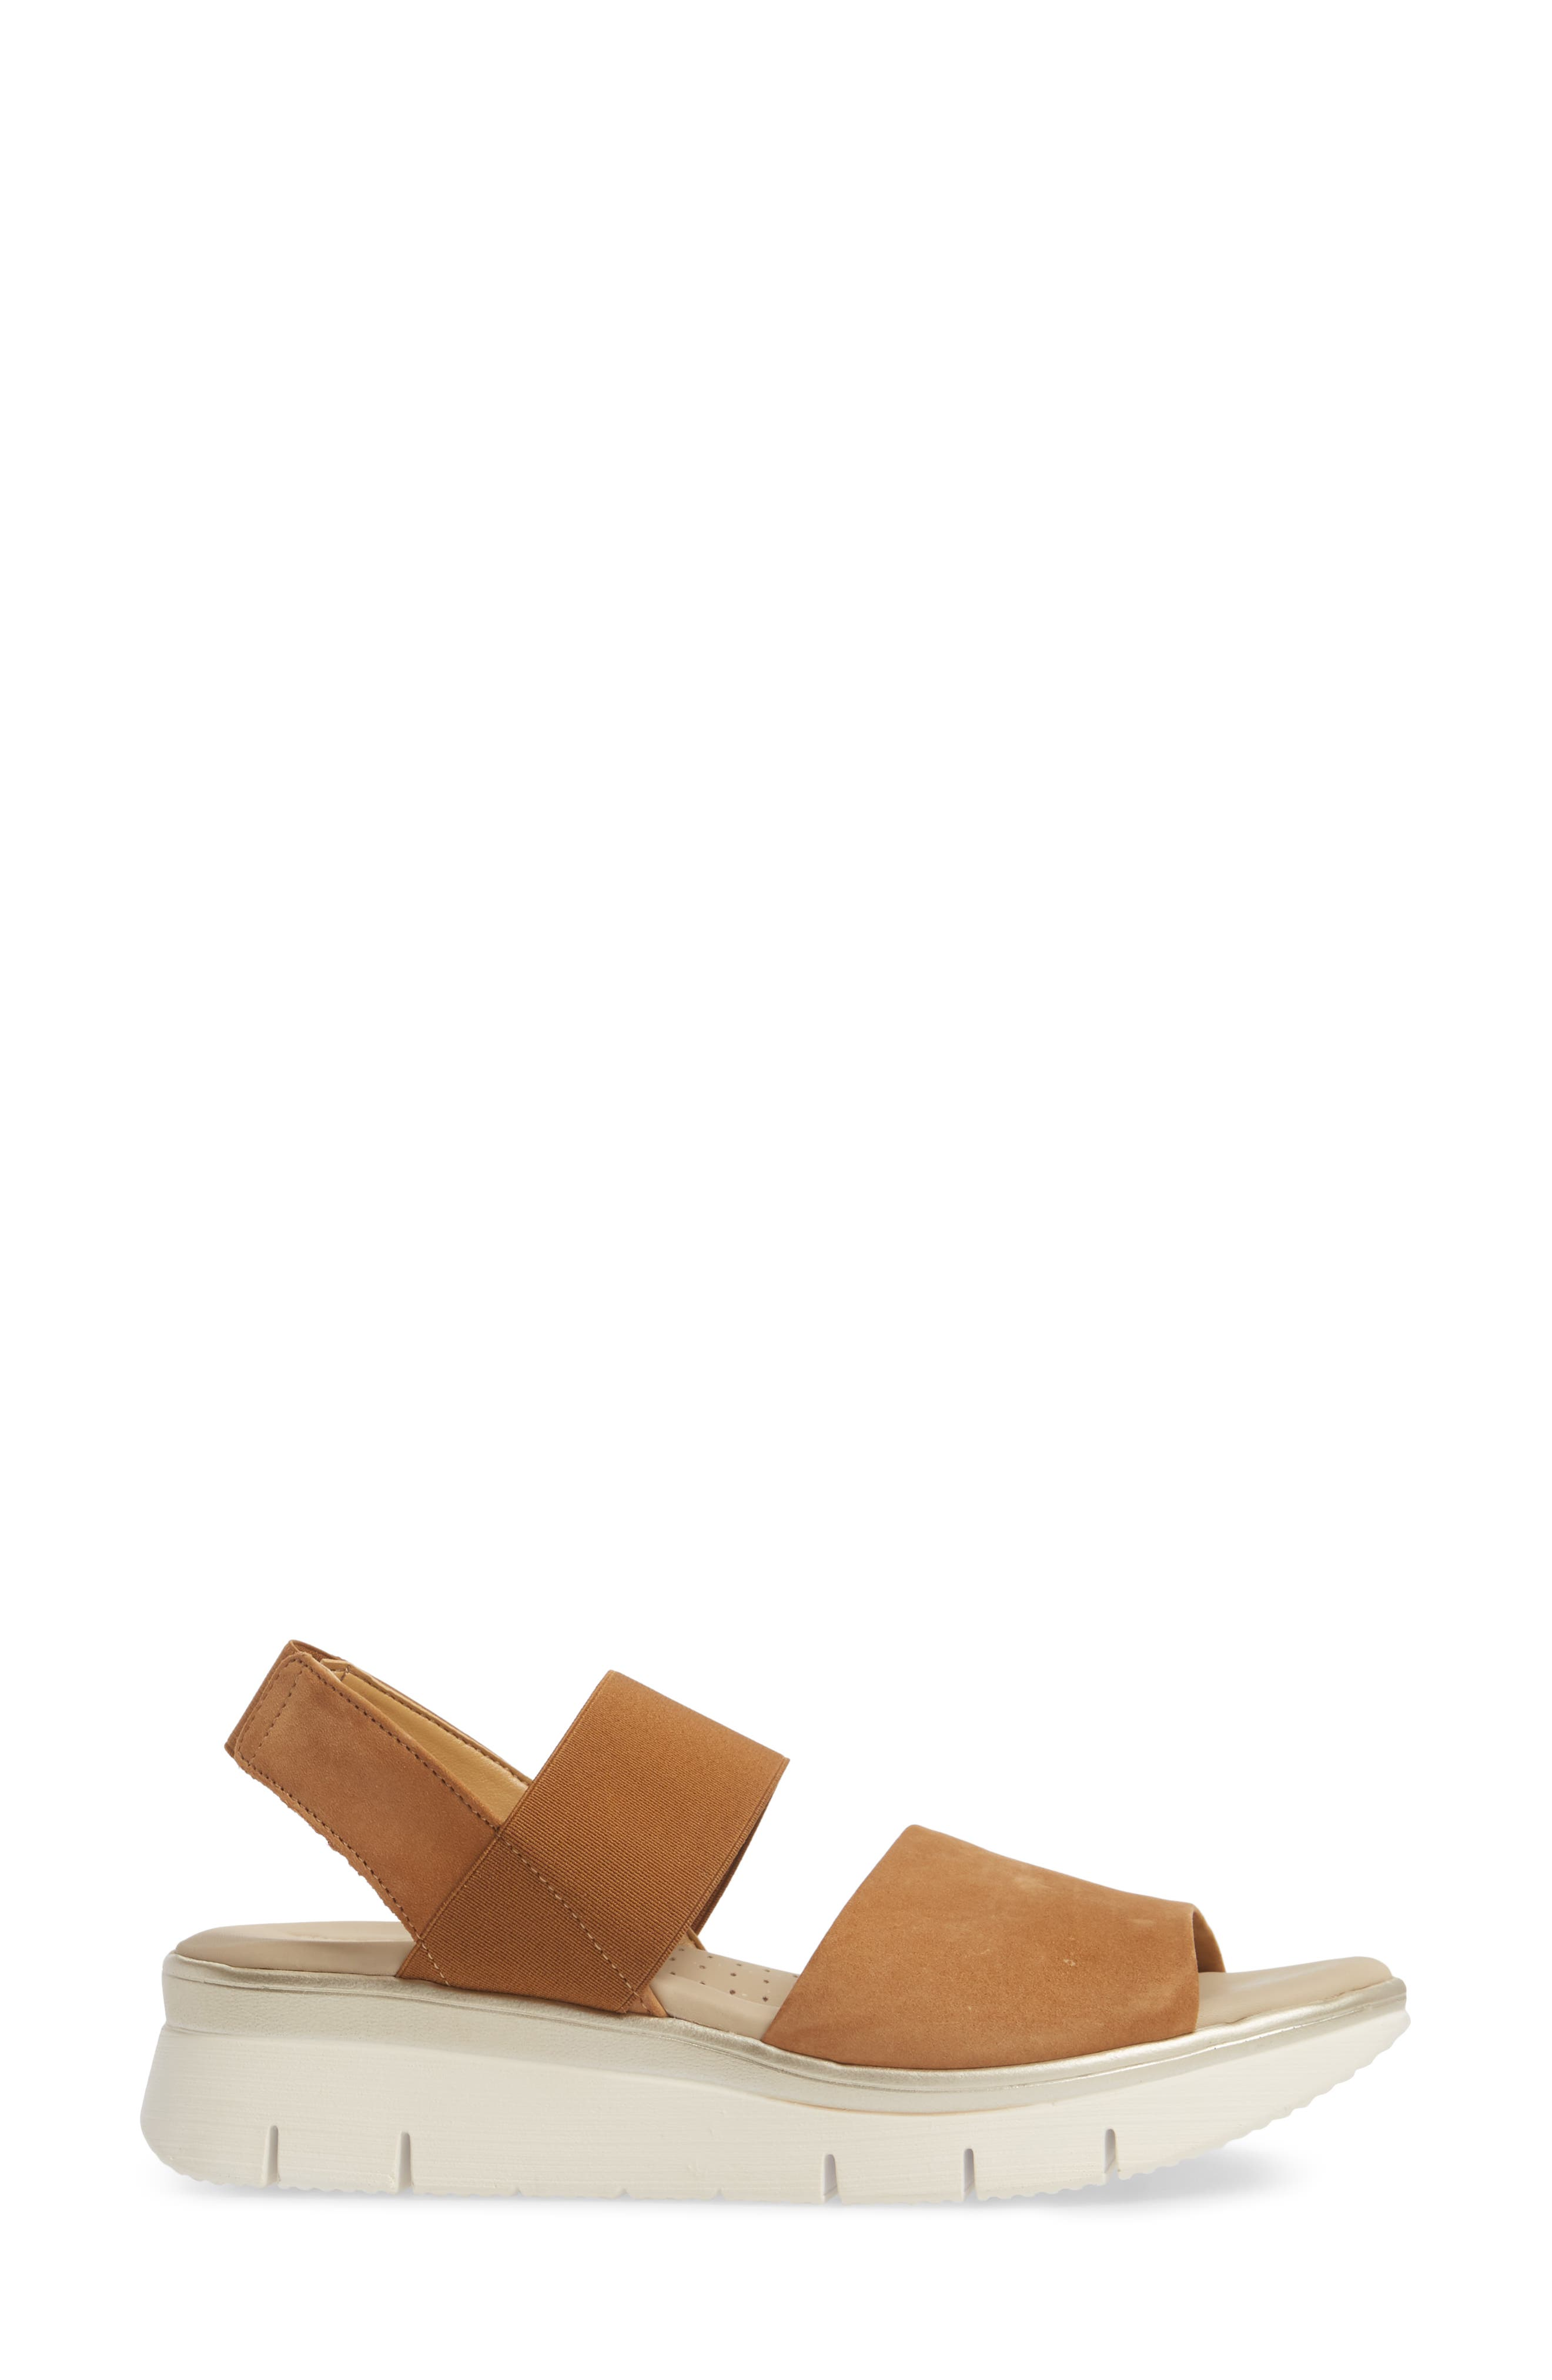 Cushy Sandal,                             Alternate thumbnail 3, color,                             Cognac Nubuck